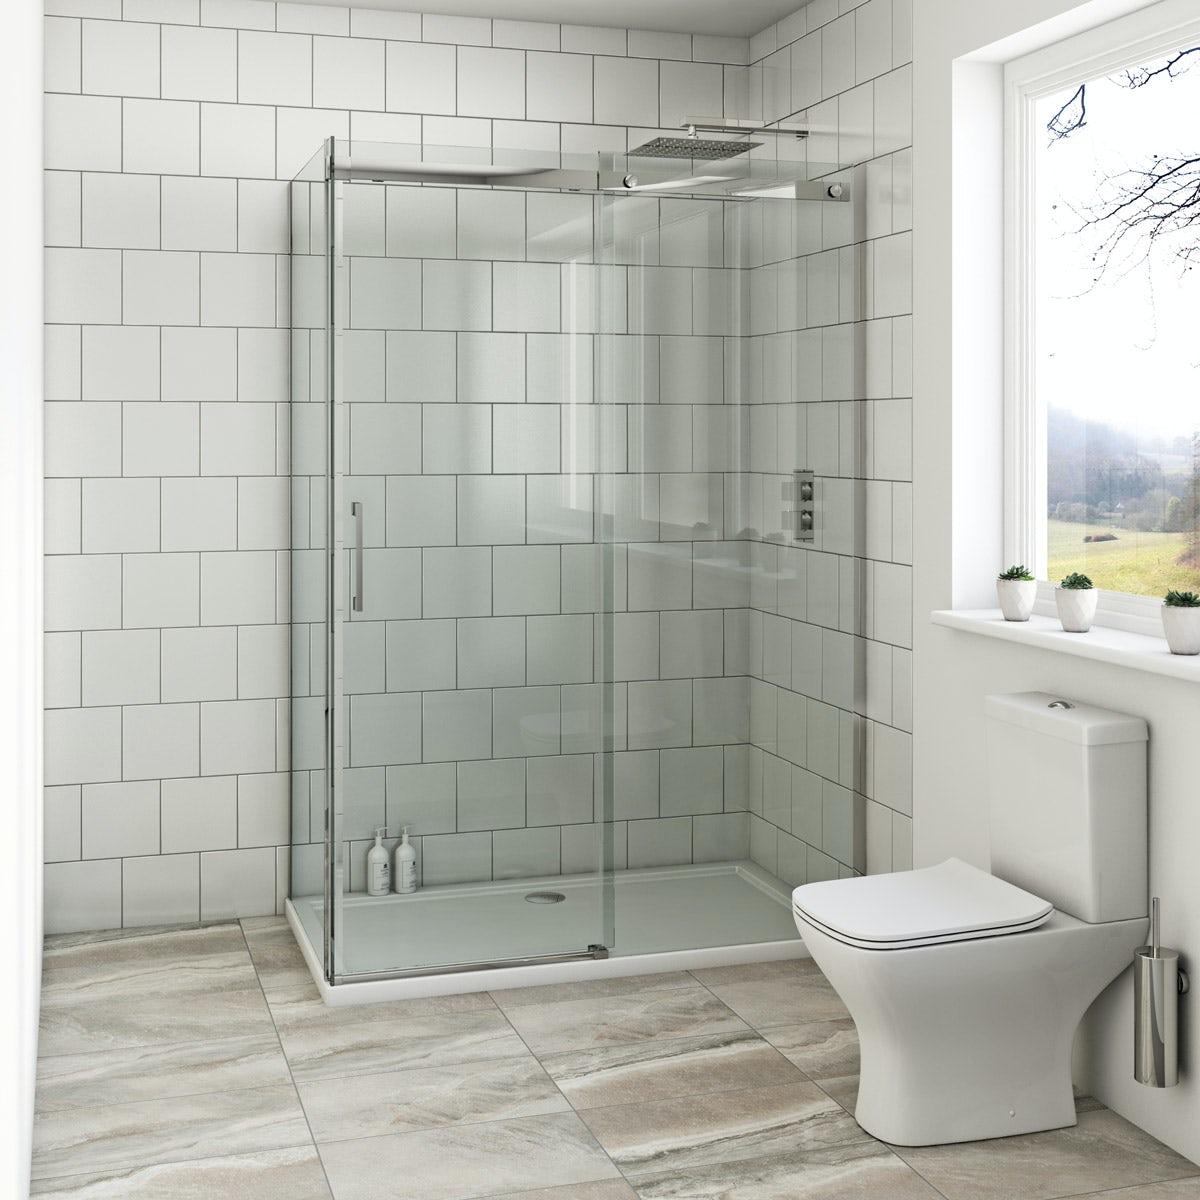 Bathroom suites with shower enclosures - Mode Harrison 8mm Easy Clean Rectangular Shower Enclosure 1200 X 800